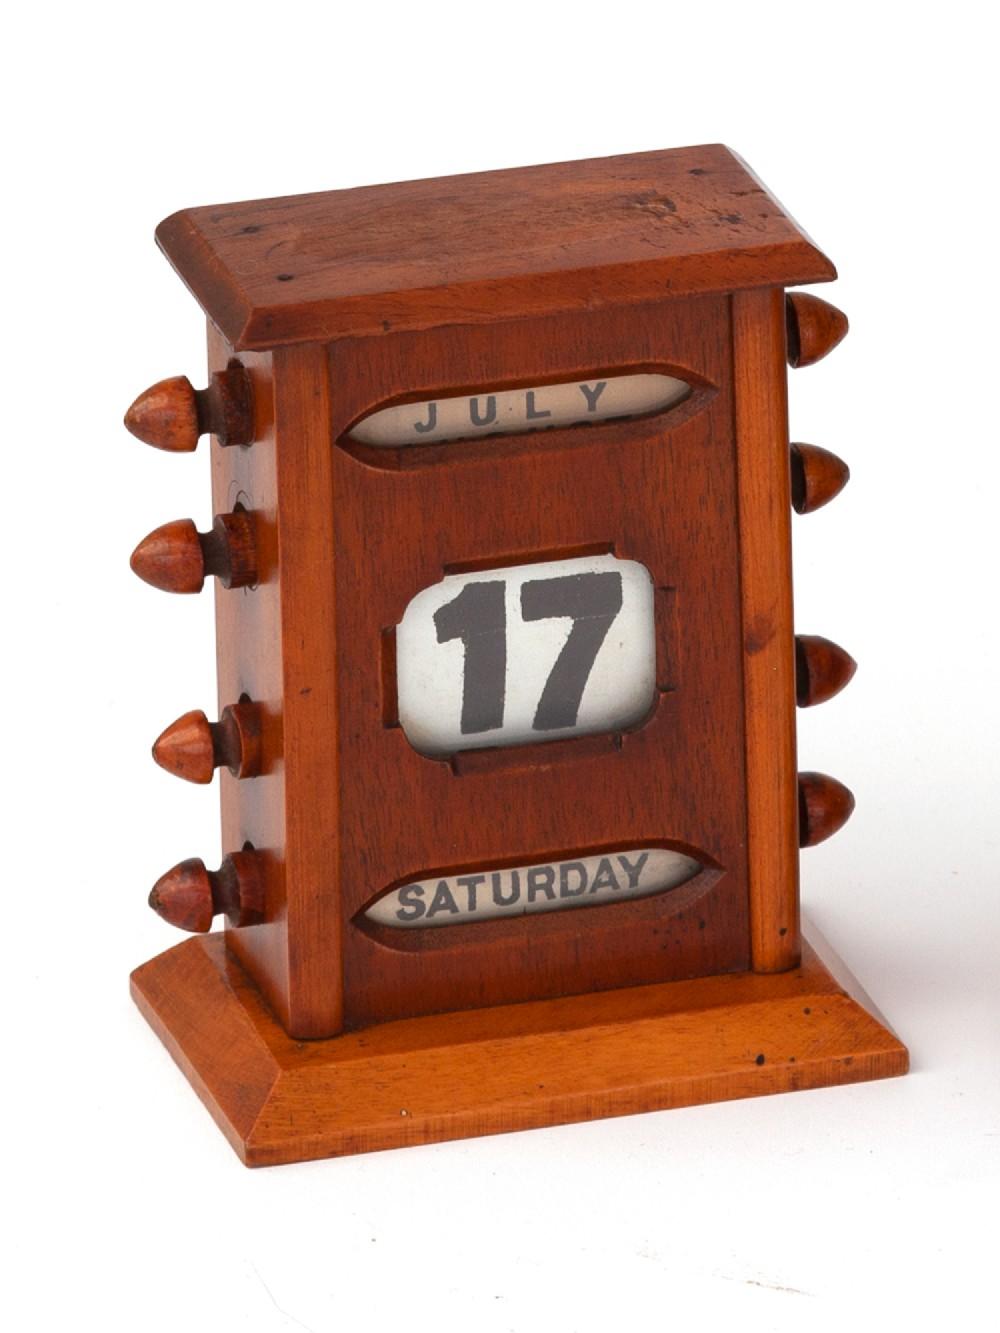 polished mahogany perpetual calendar with bevel edged windows